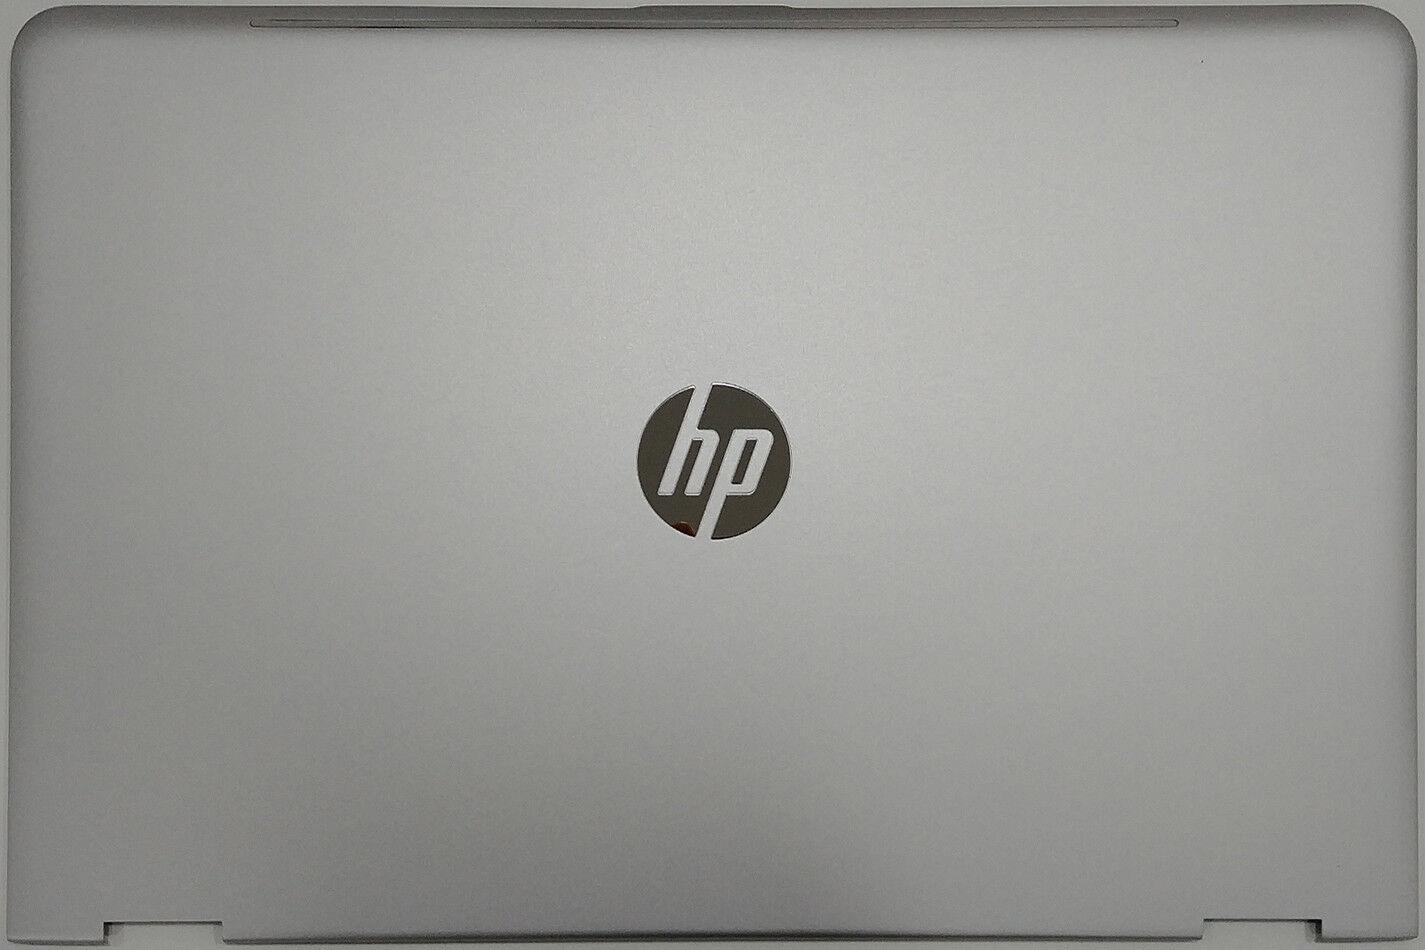 BRAND NEW GENUINE HP ENVY M6-1000 SERIES FRONT BEZEL TRIM 686897-001 AP0R1000310